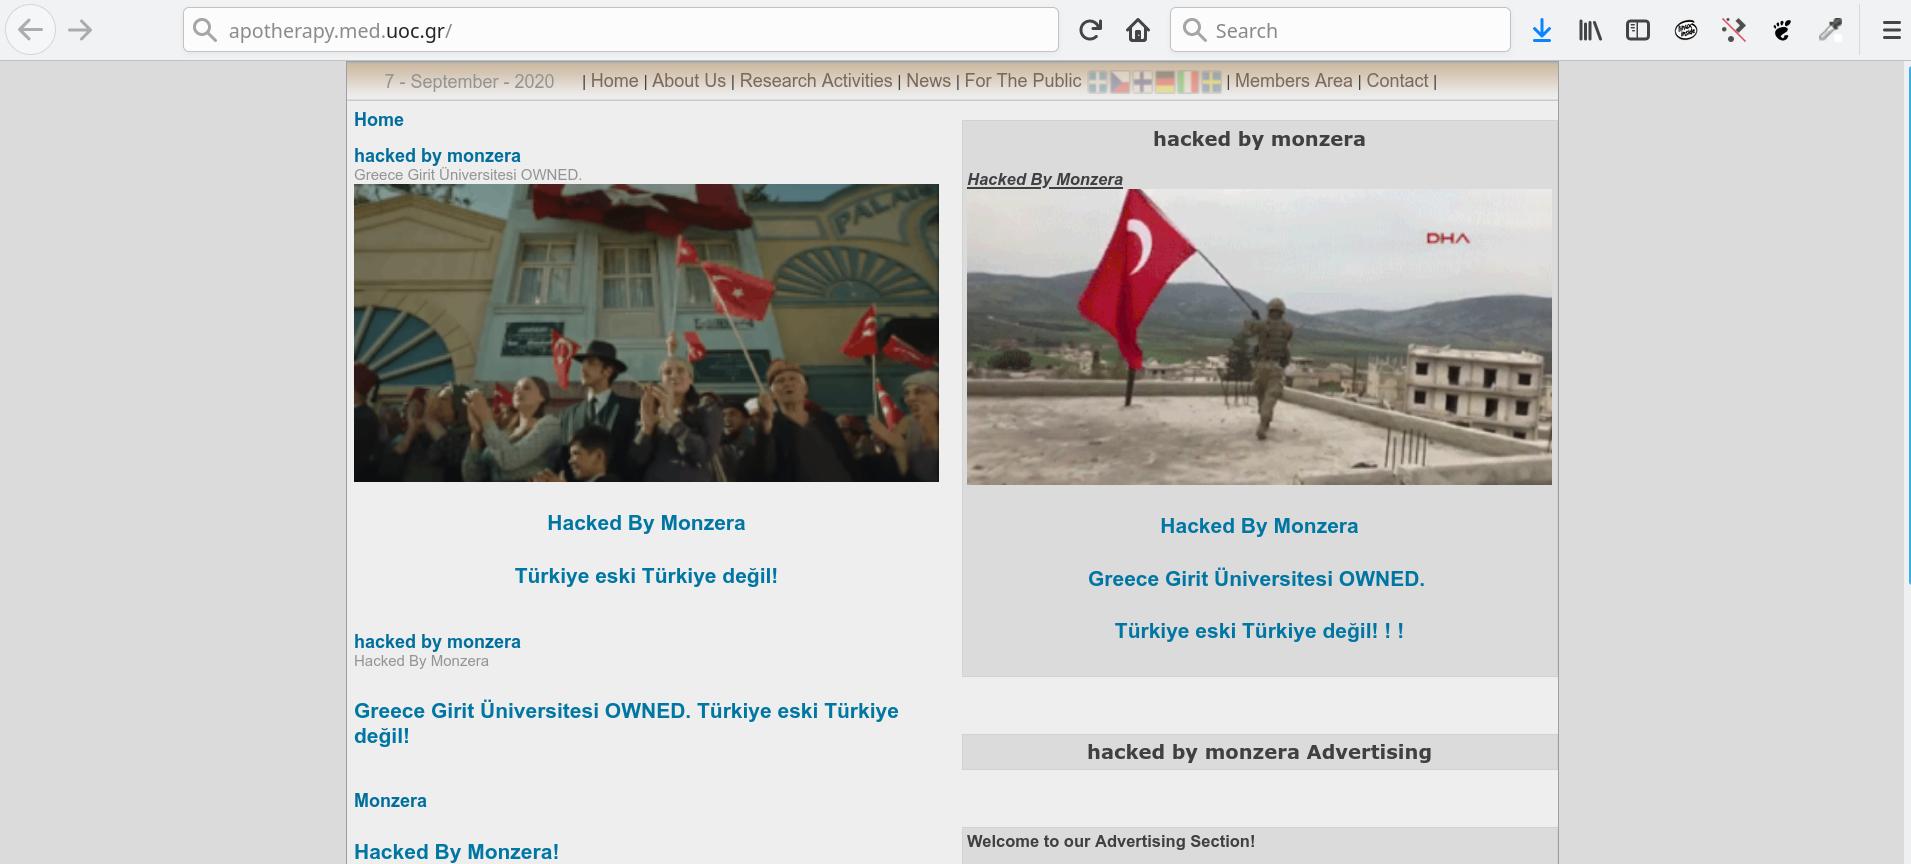 Screenshot 2020 09 07 19 07 00 - Παραβιάστηκαν subdomains του sch.gr και του uoc.gr